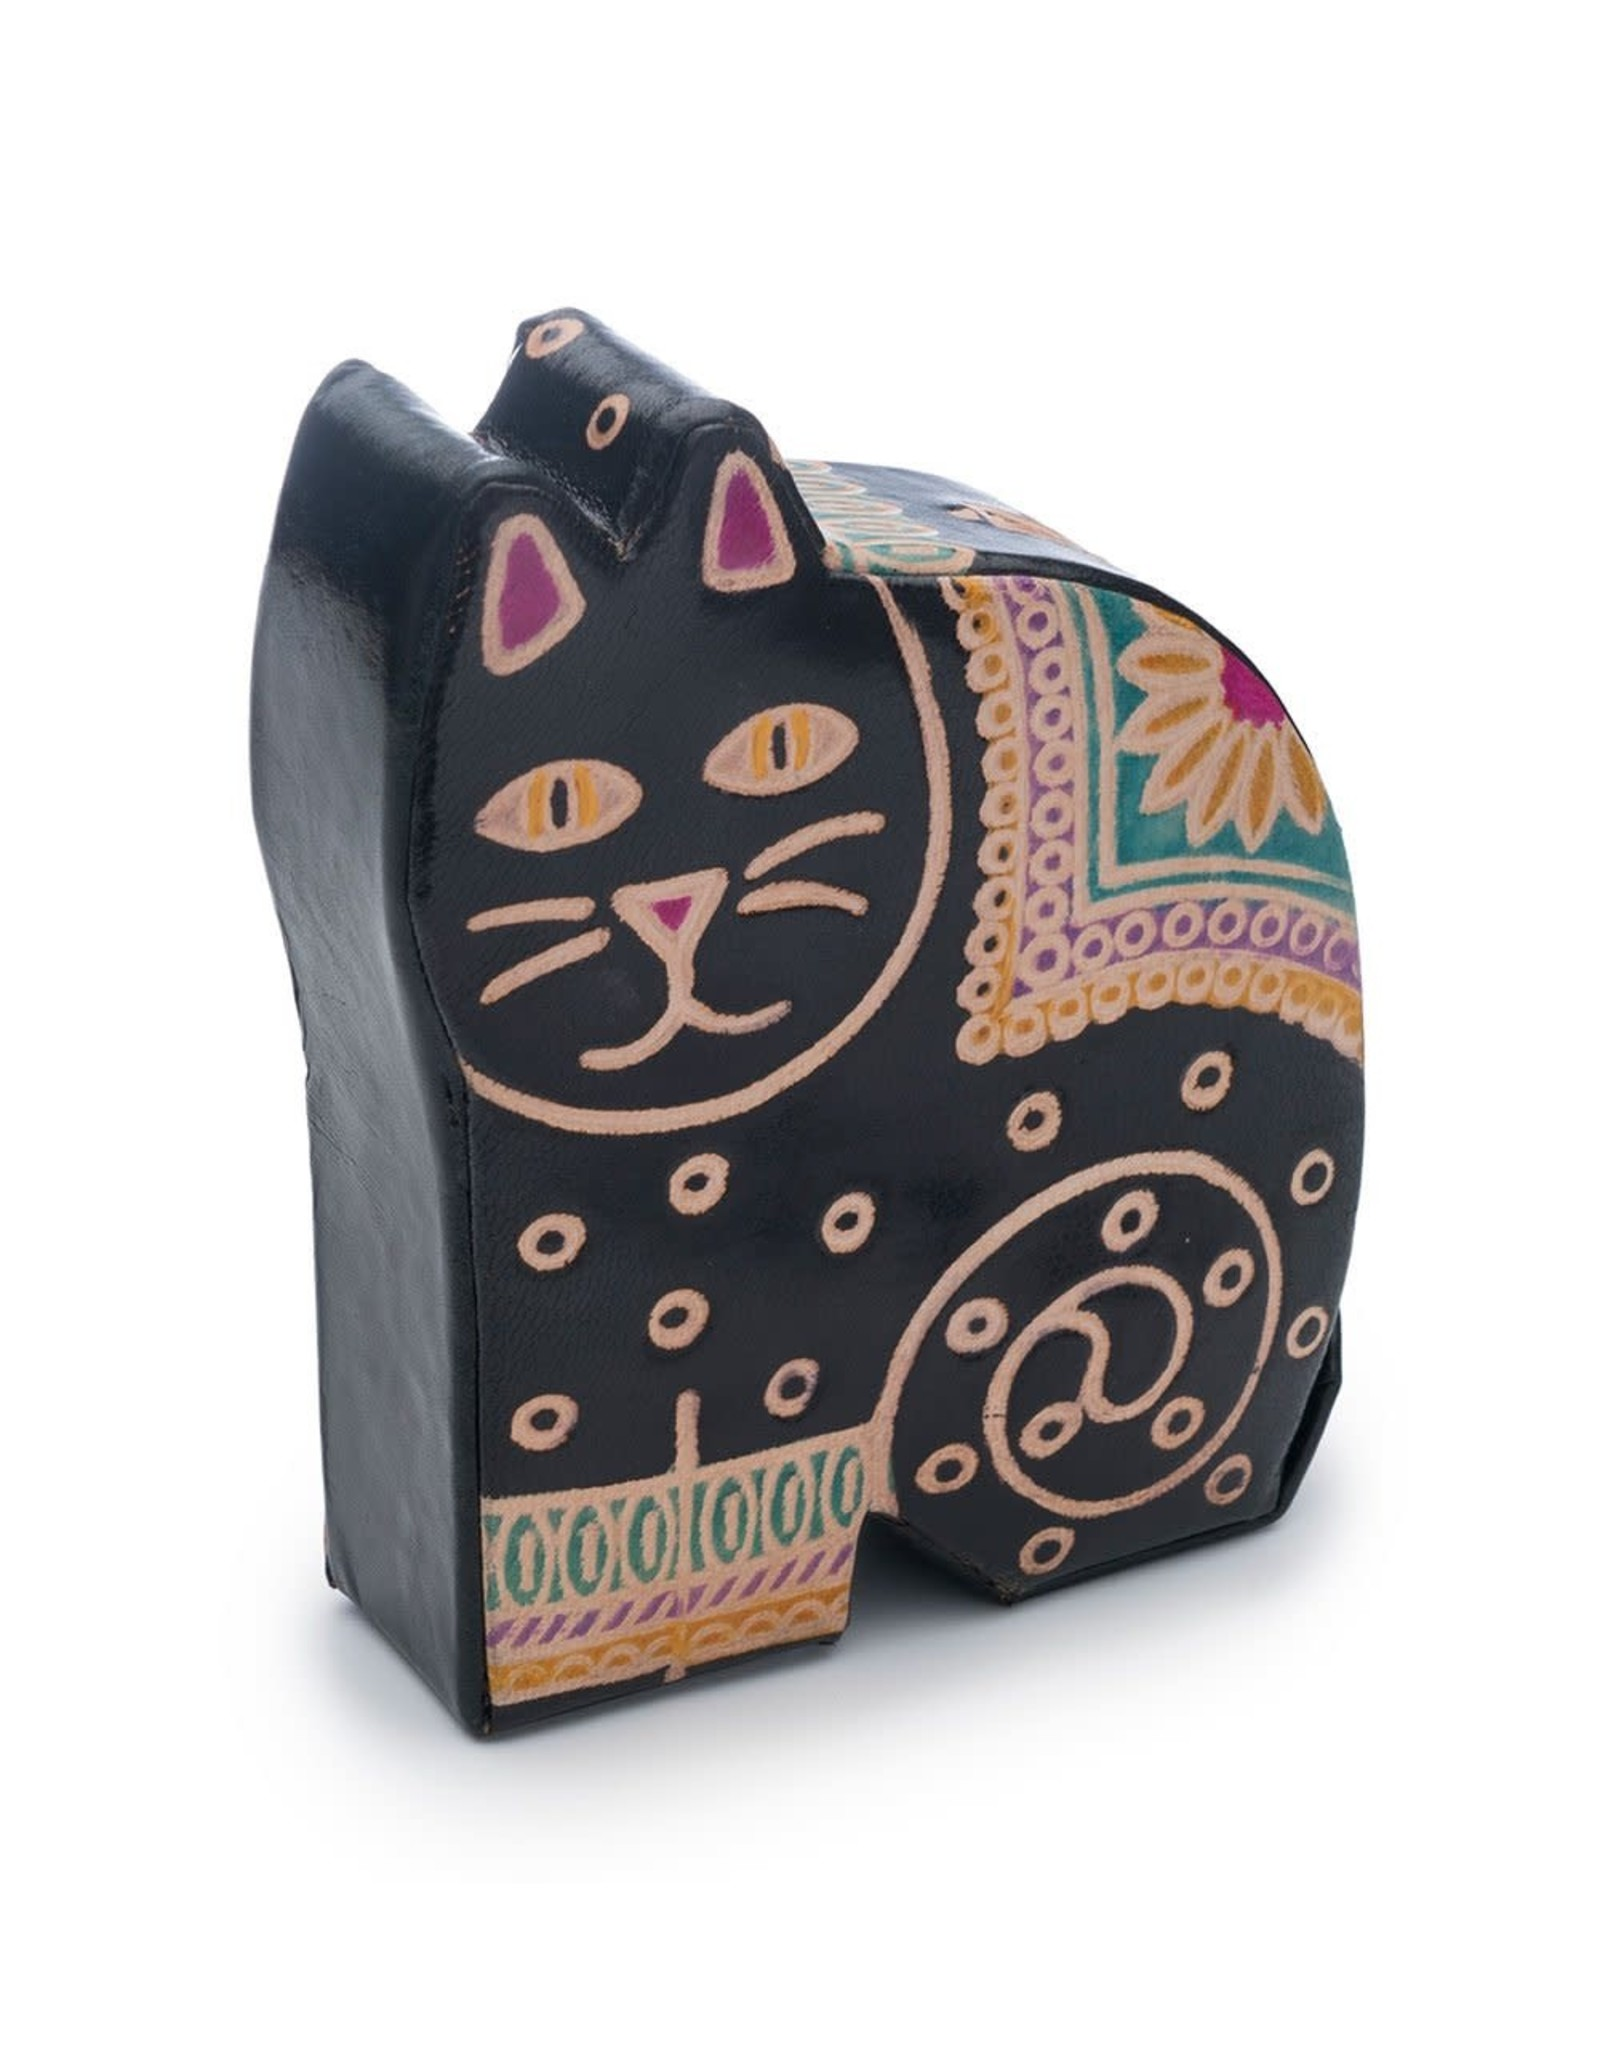 Matr Boomie Leather Kitty Bank, India